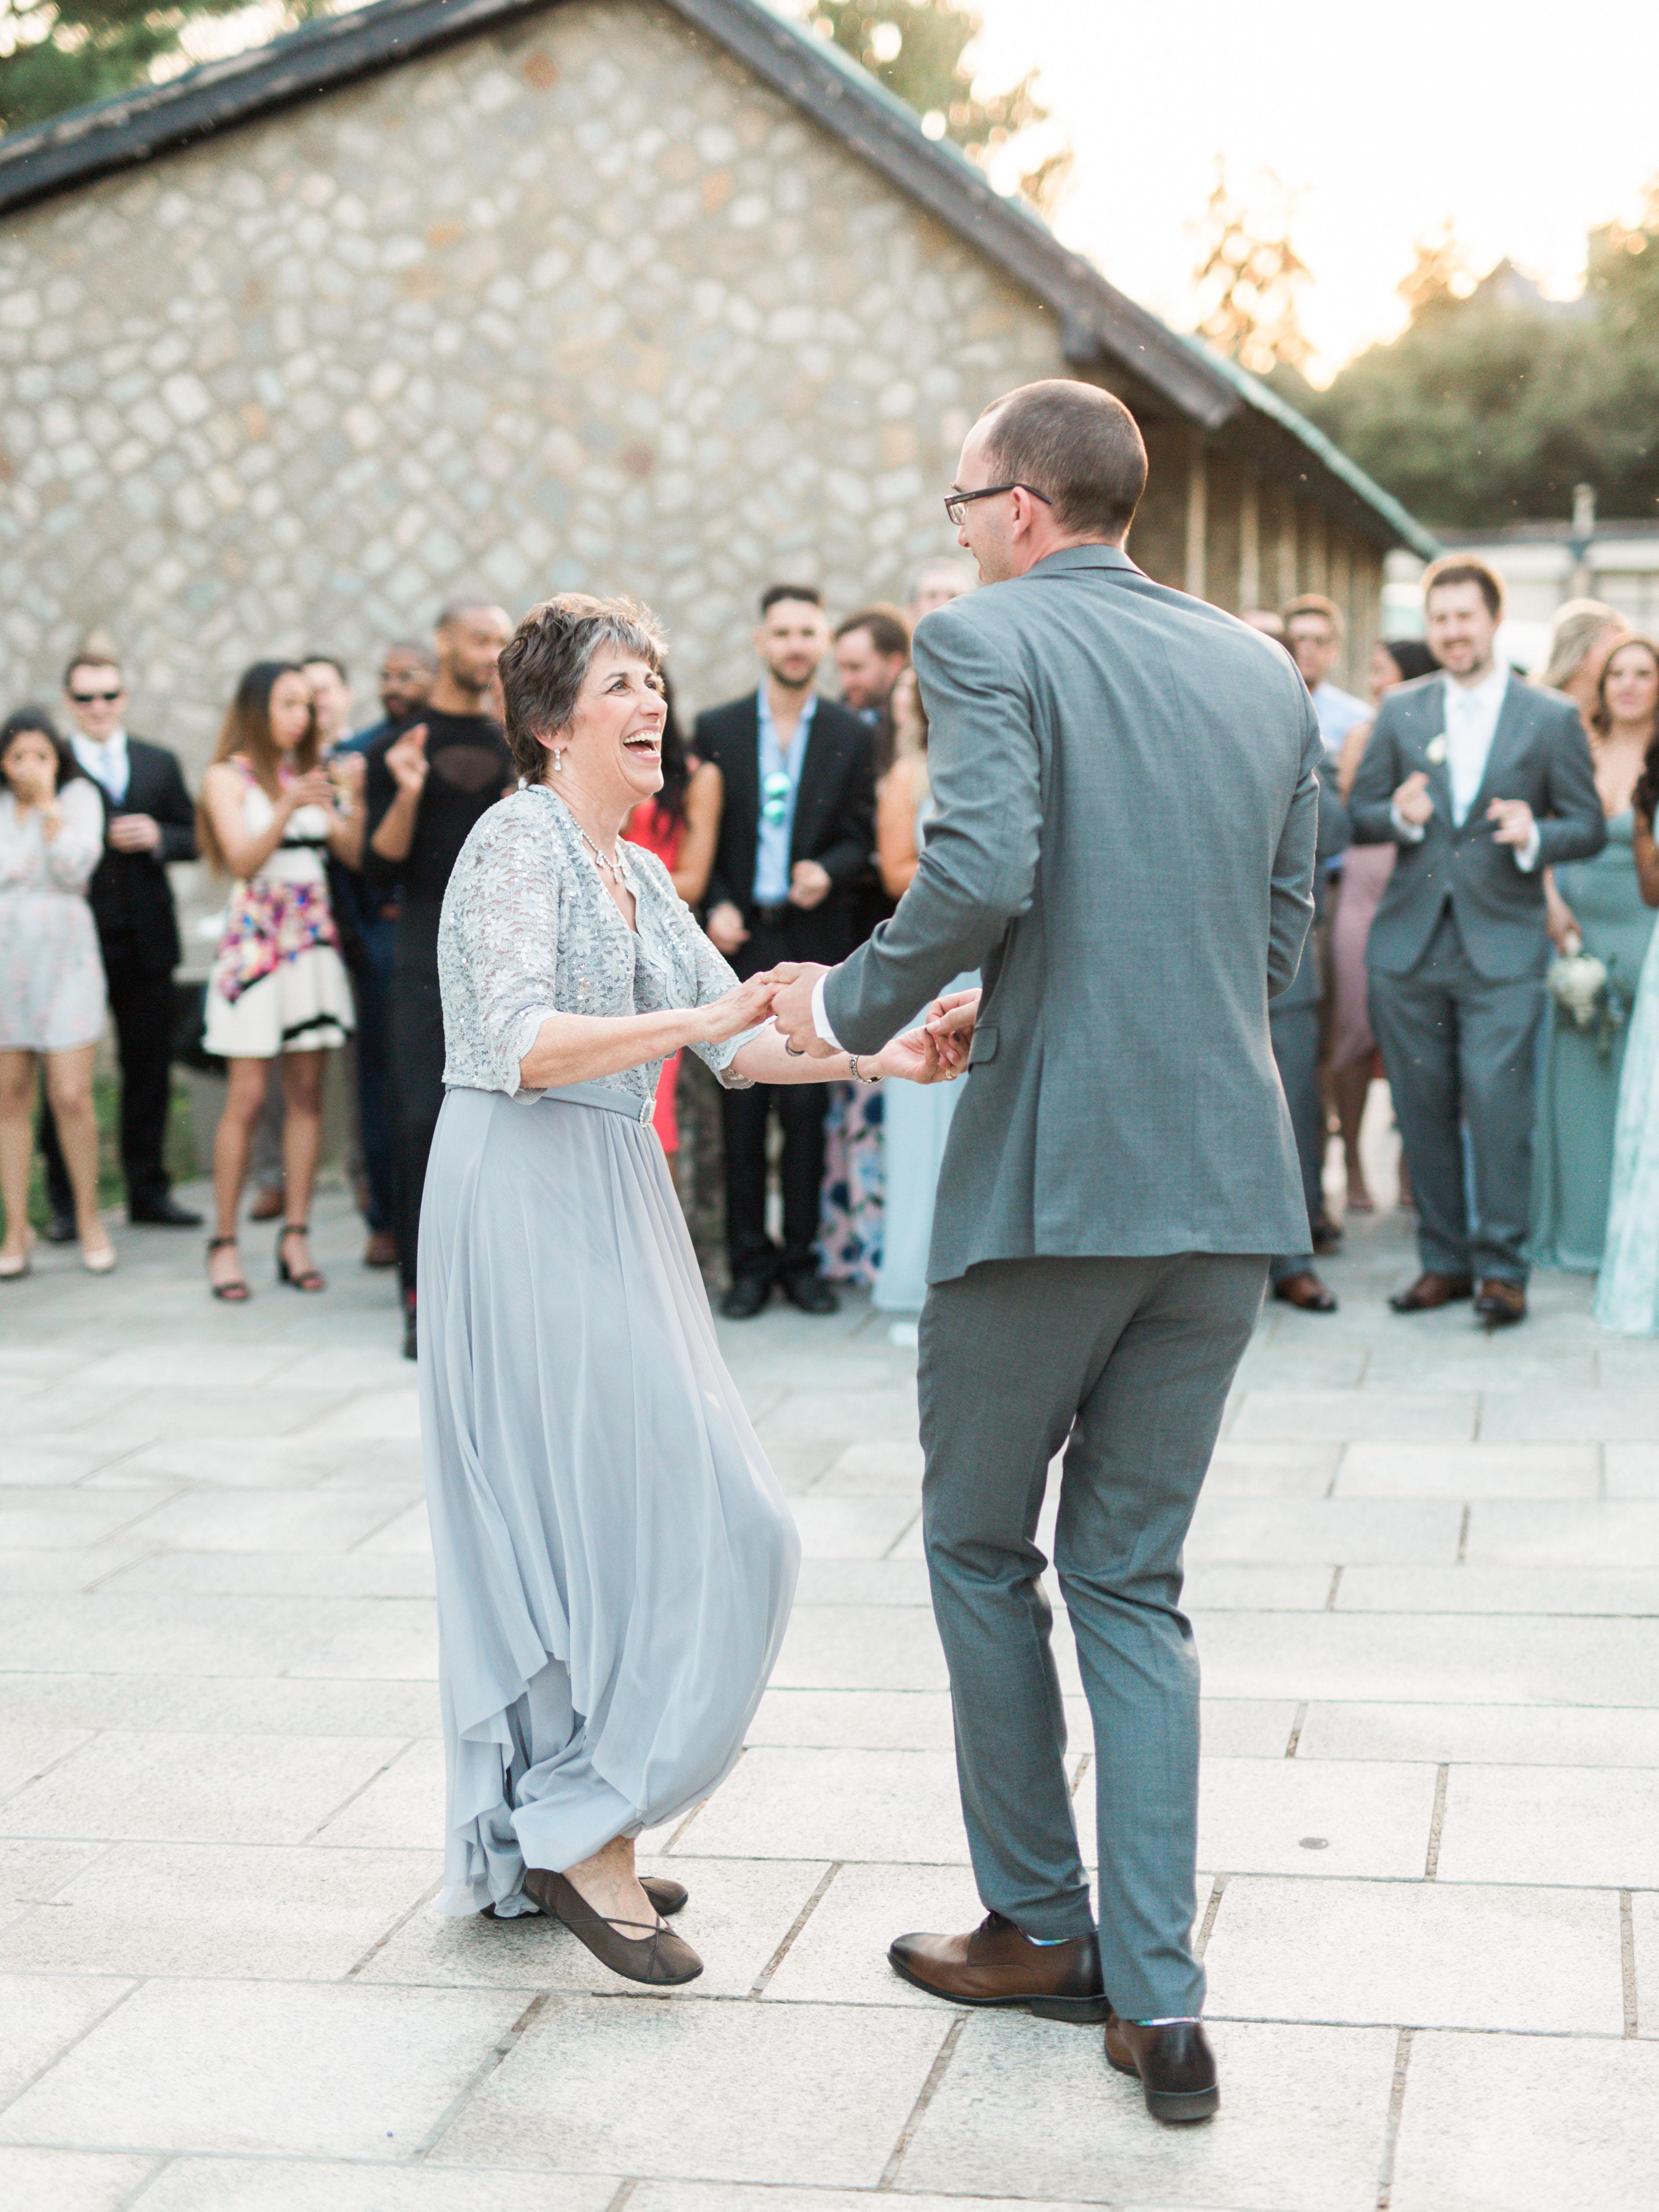 wedding reception groom mother dance